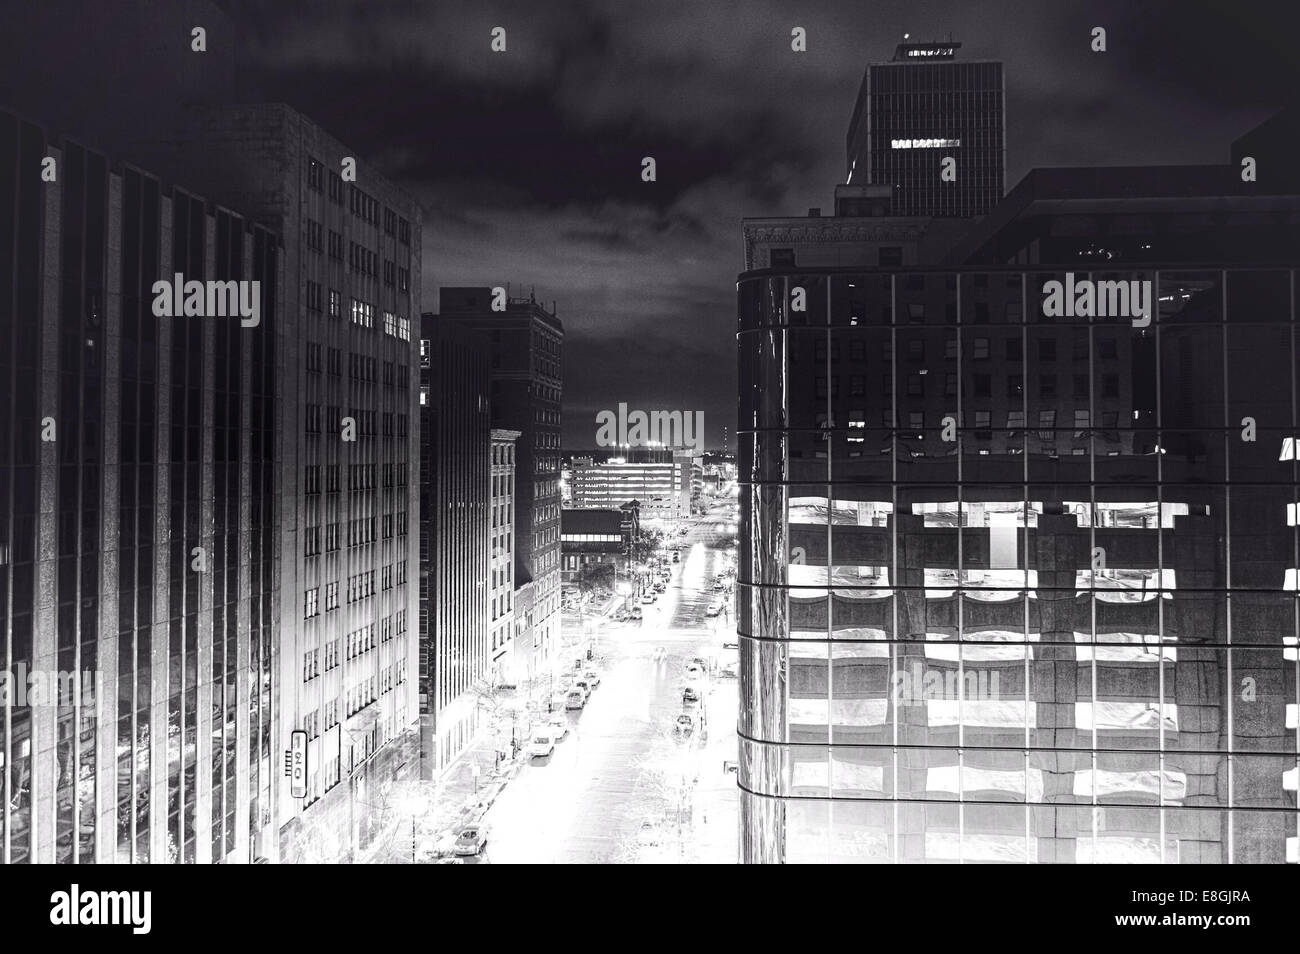 Cityscape at night, Indianapolis, Indiana, America, USA - Stock Image